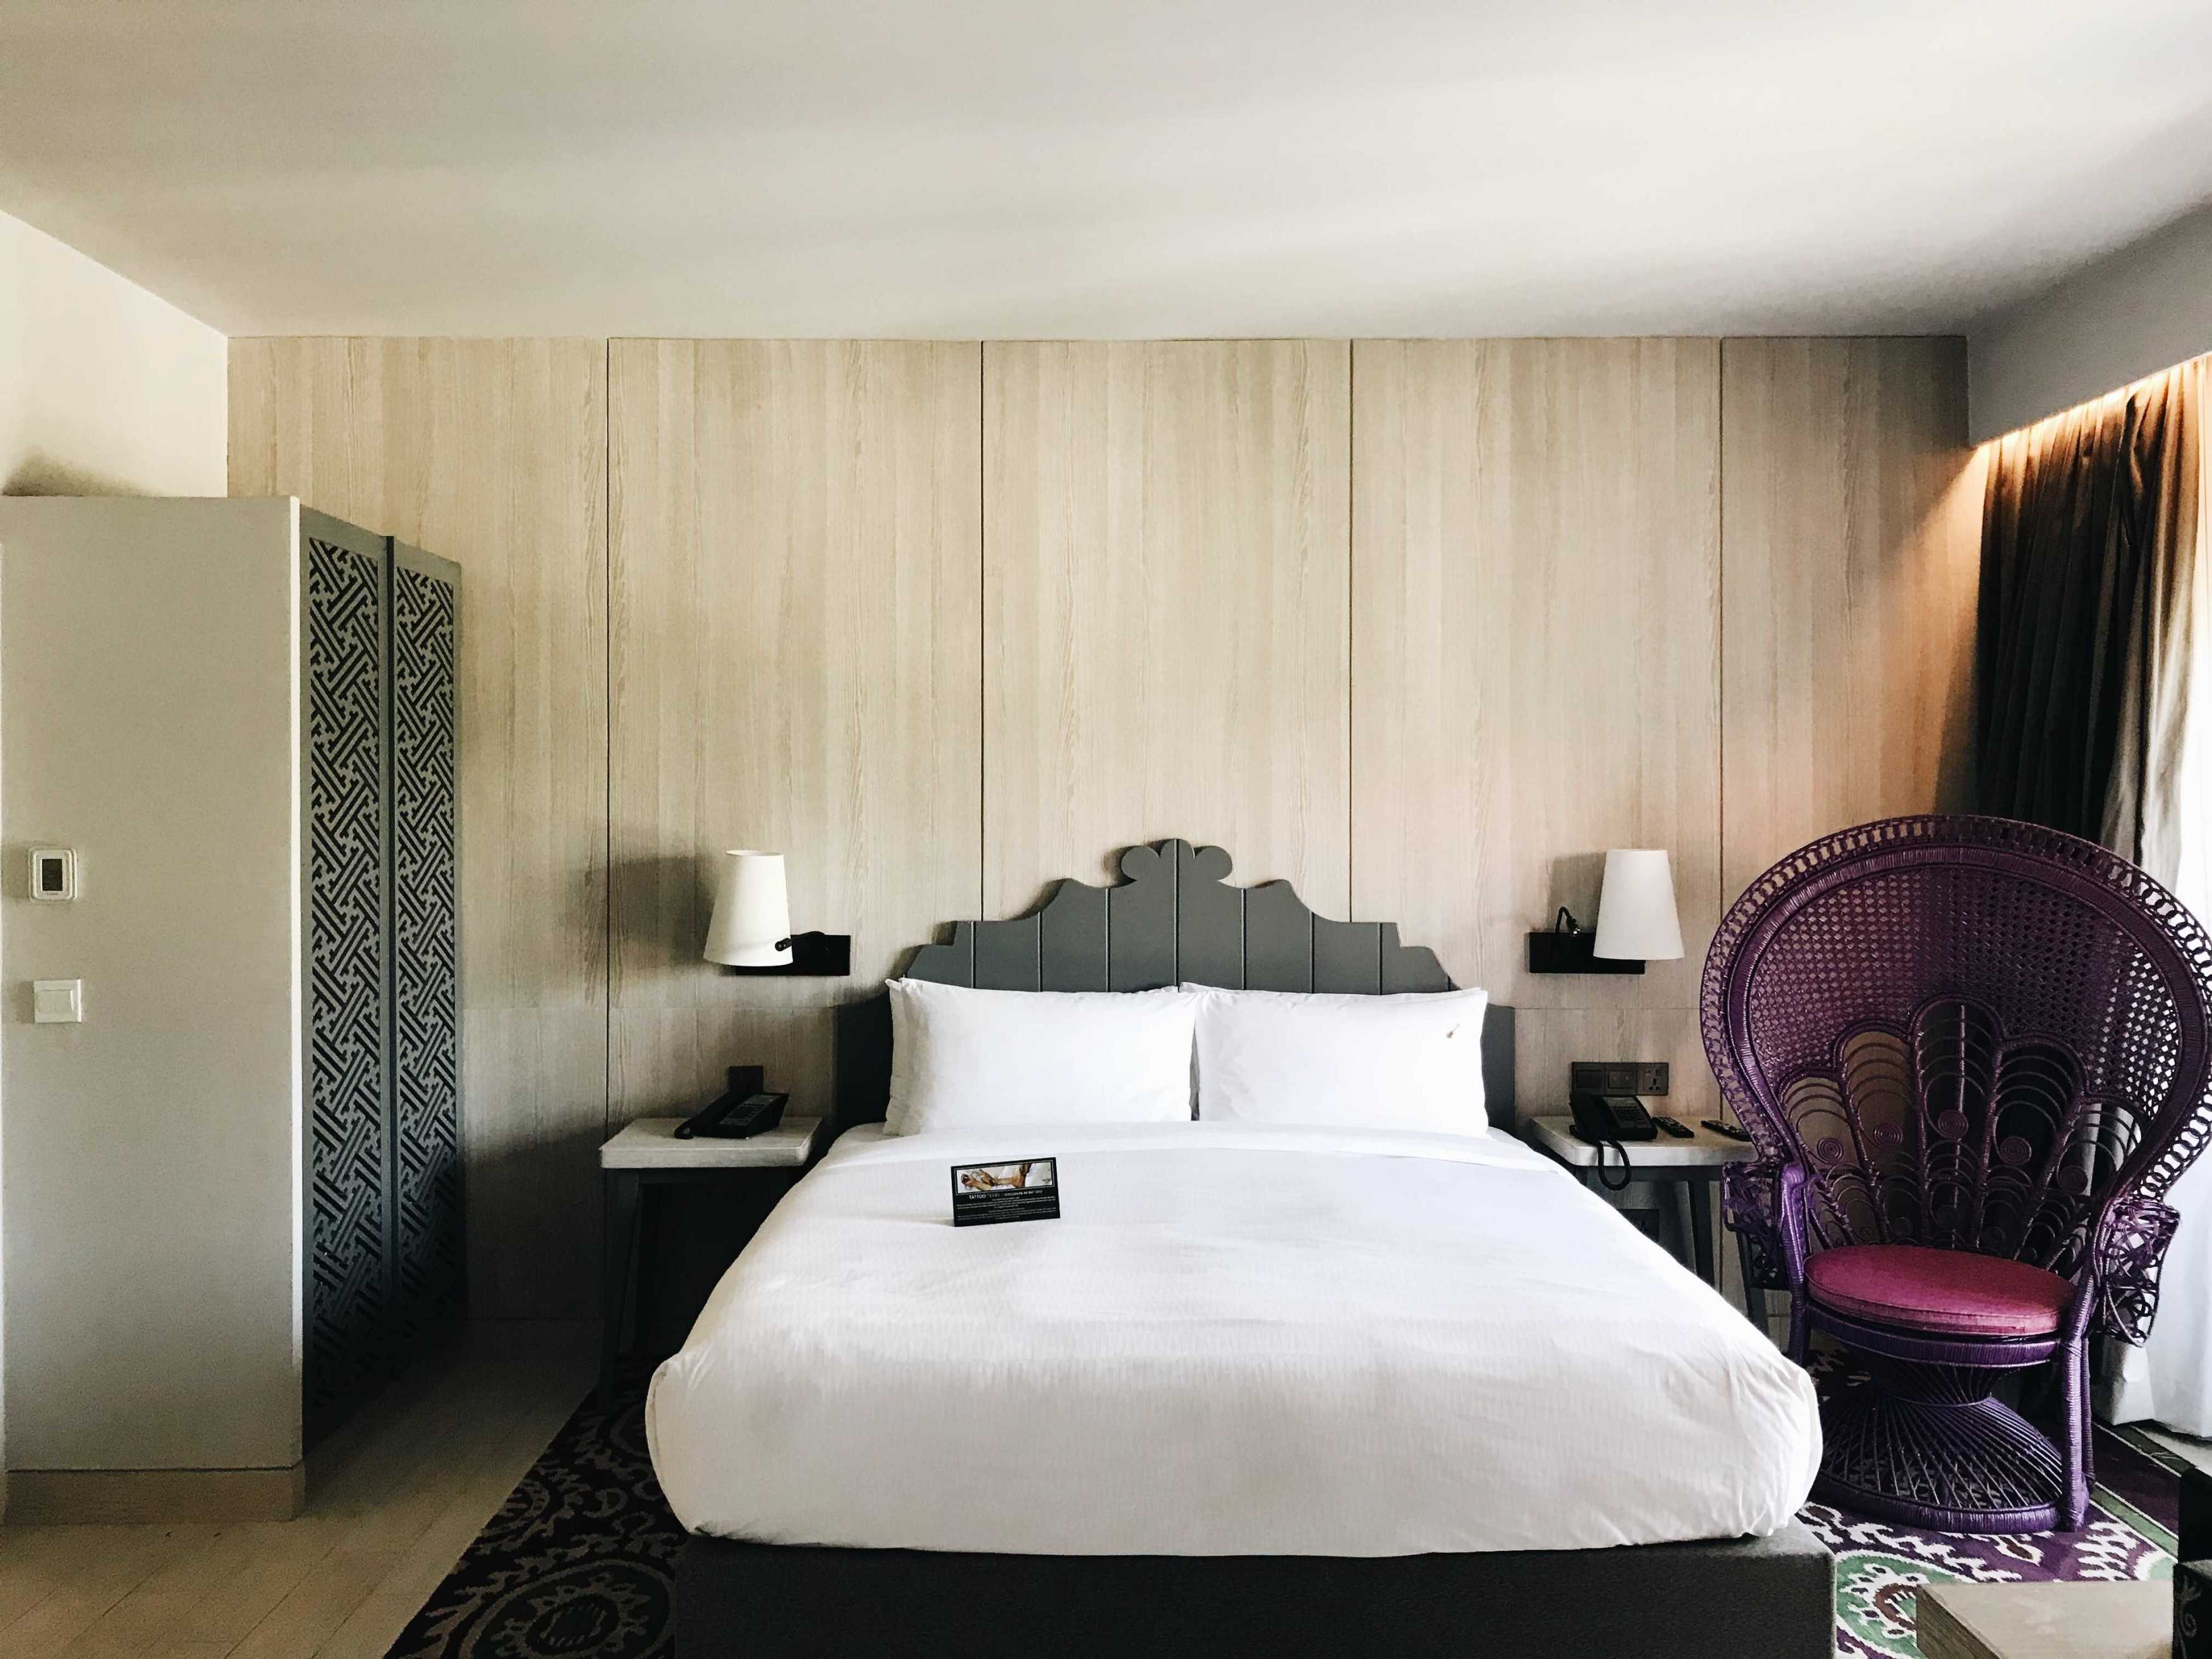 All Interior Hard Rock Hotel - Guest Room Bali, Indonesia Bali, Indonesia All-Interior-Hard-Rock-Hotel   69376